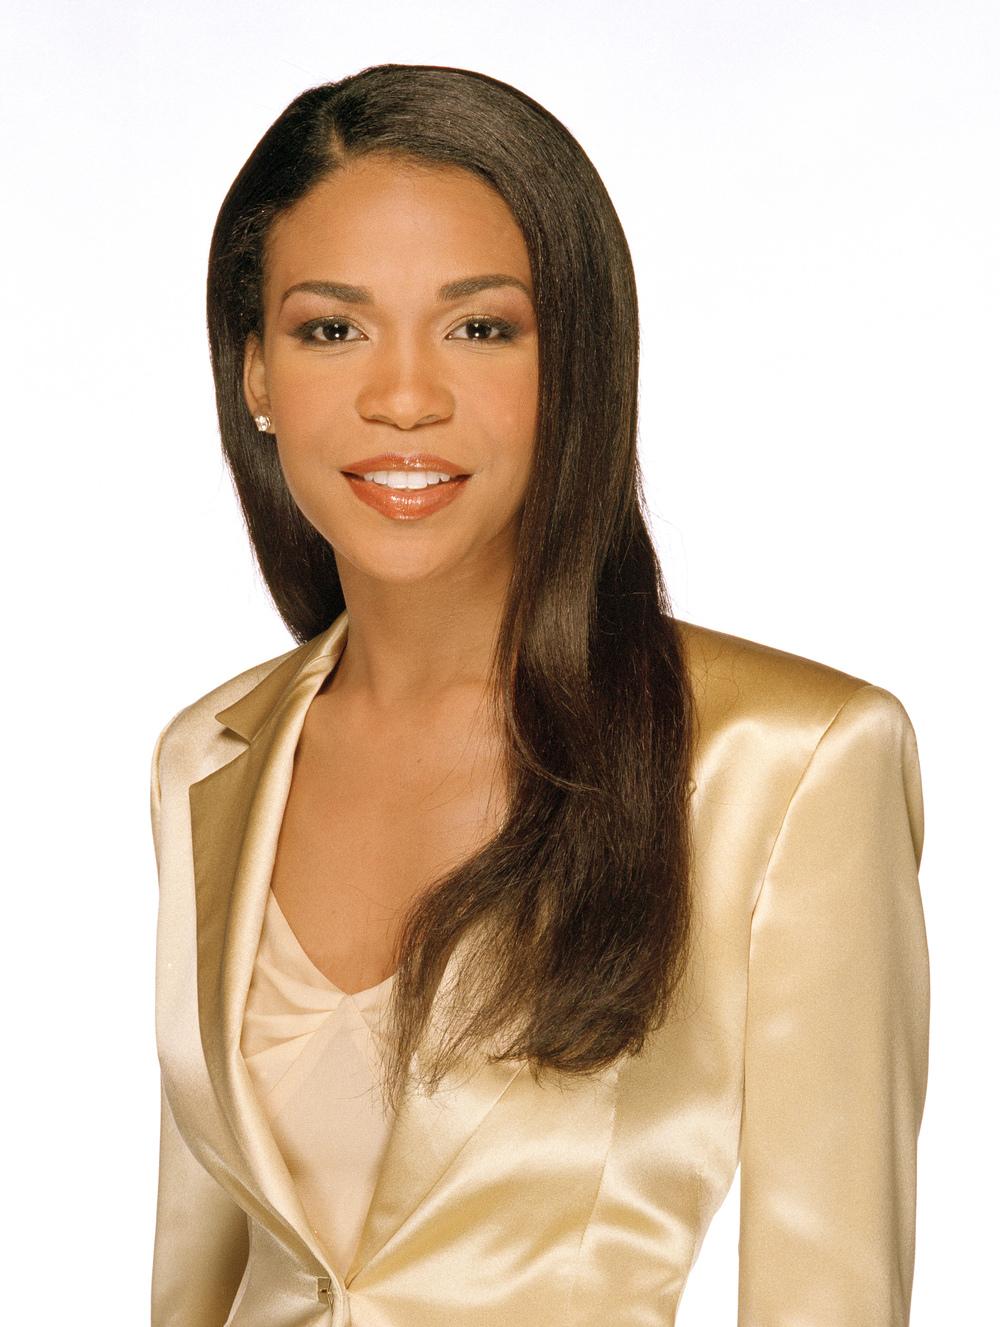 Michelle Williams of Destiny's Child Singer-songwriter